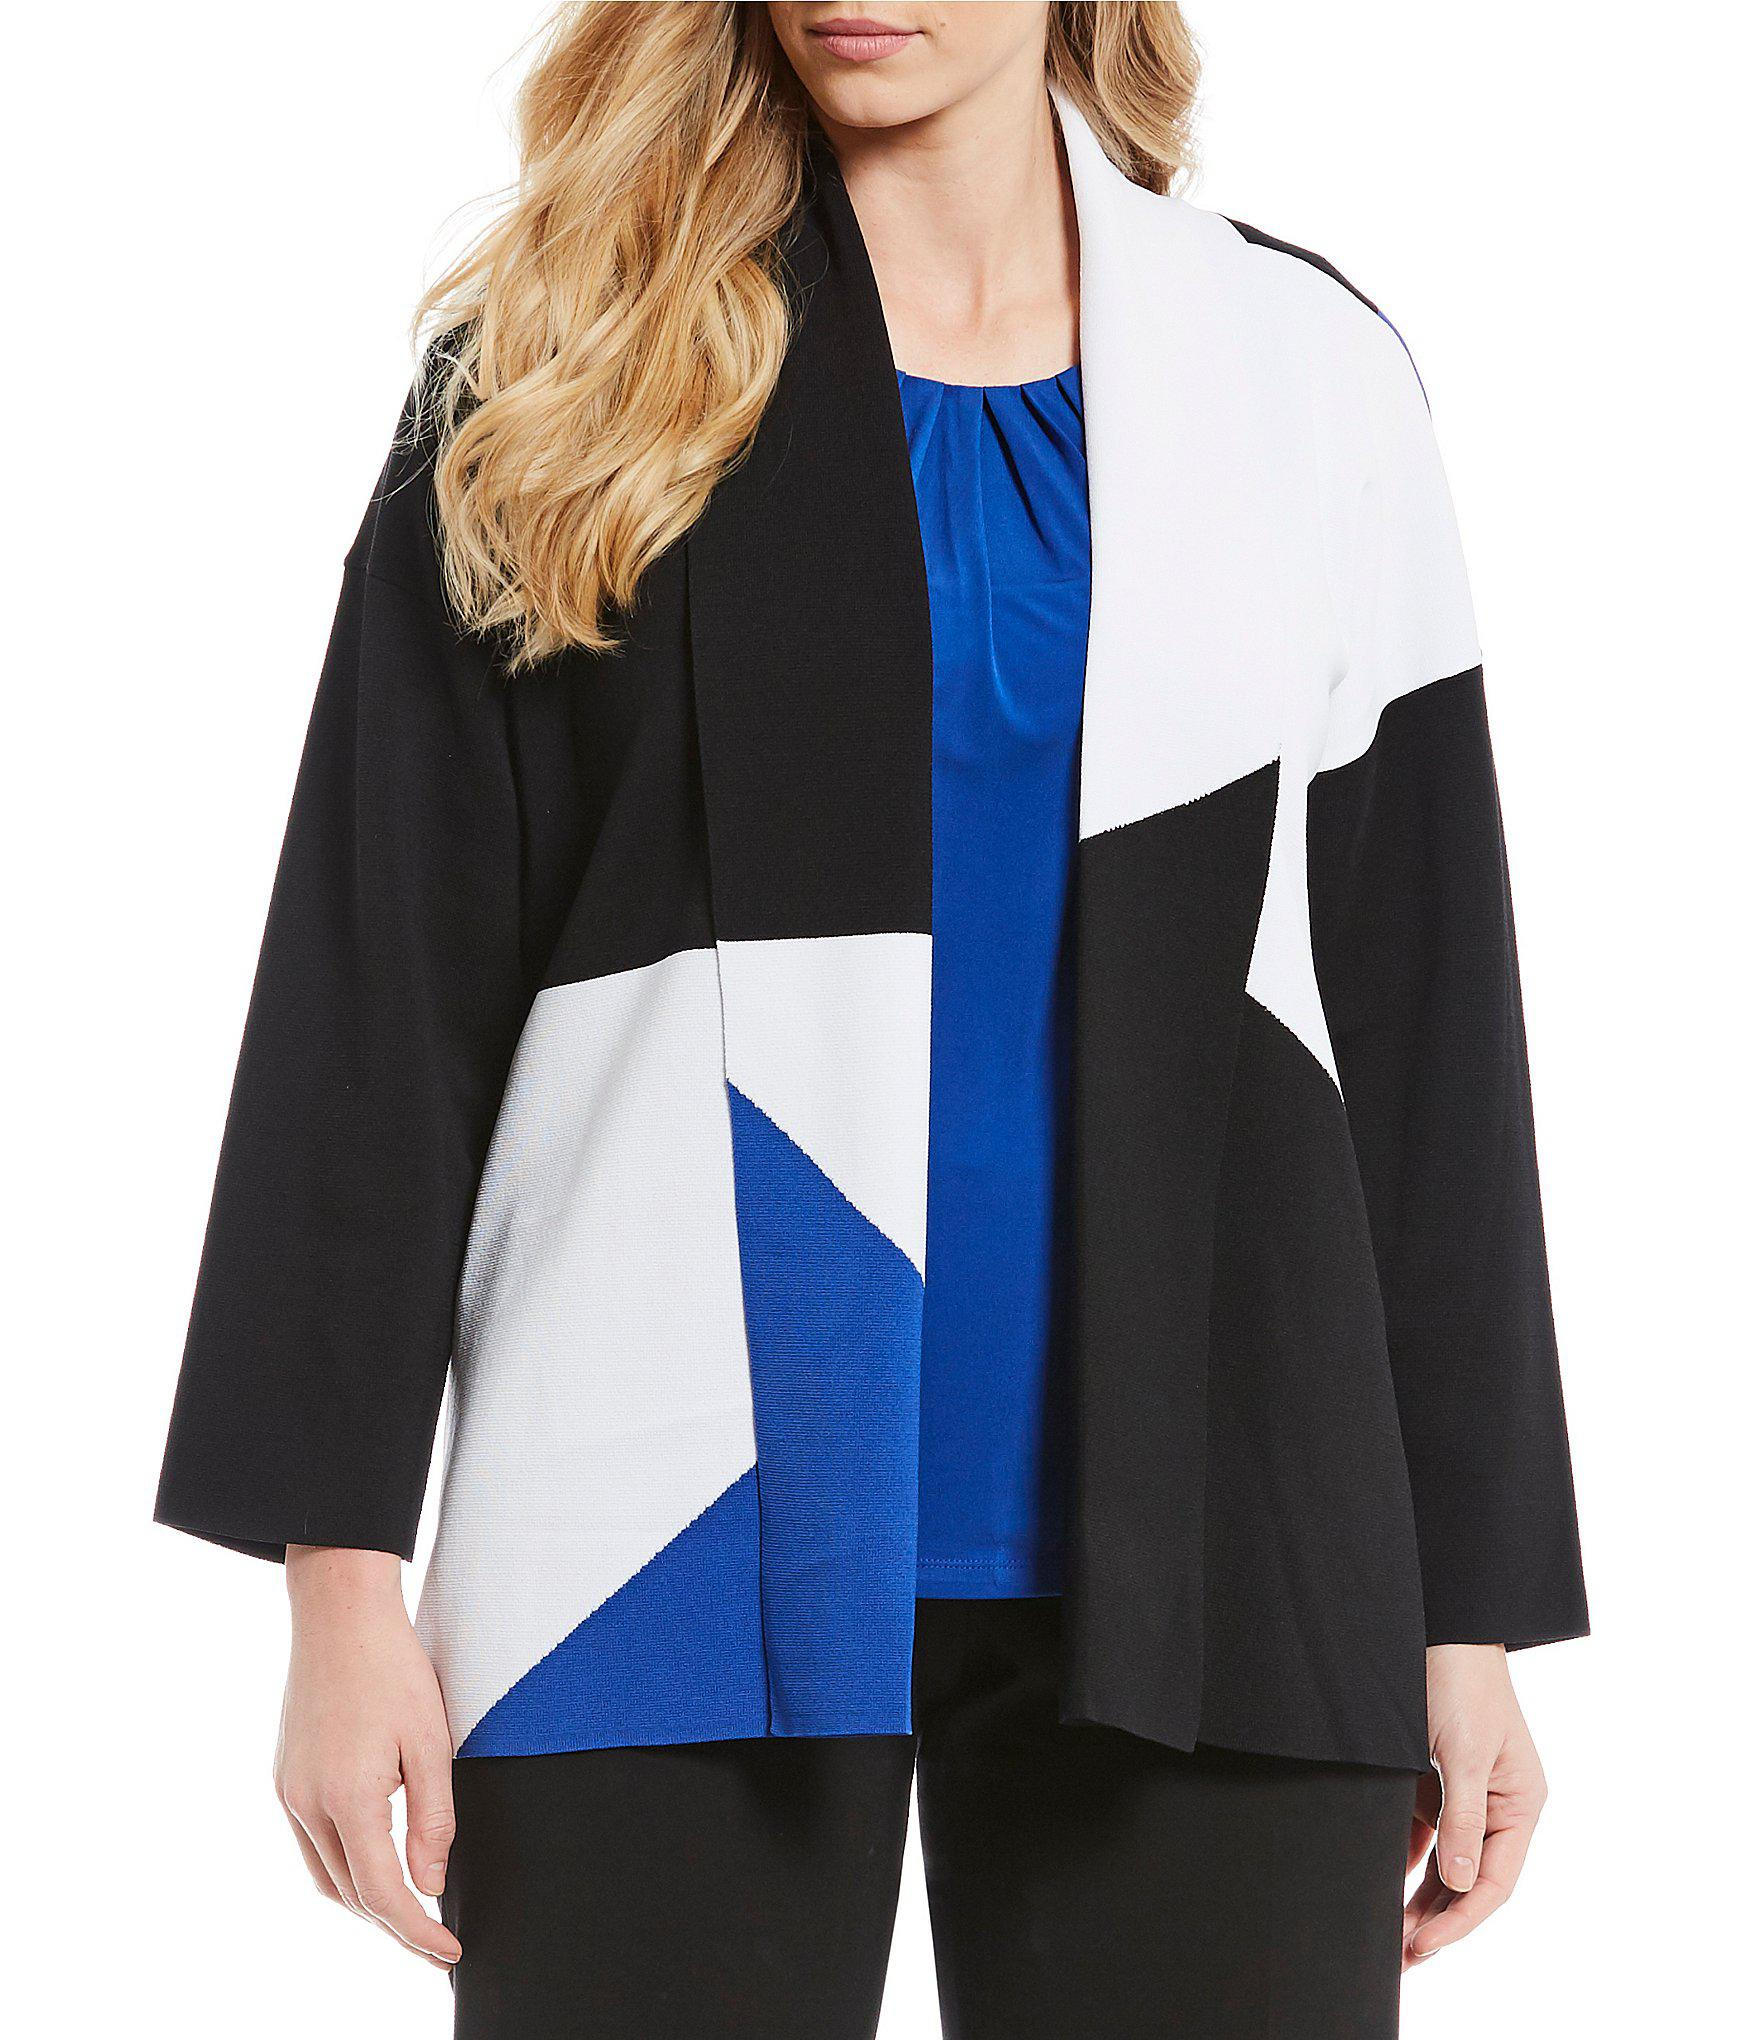 97398d495c2 Lyst - Calvin Klein Plus Size Knit Colorblock Open Front Jacket in Black